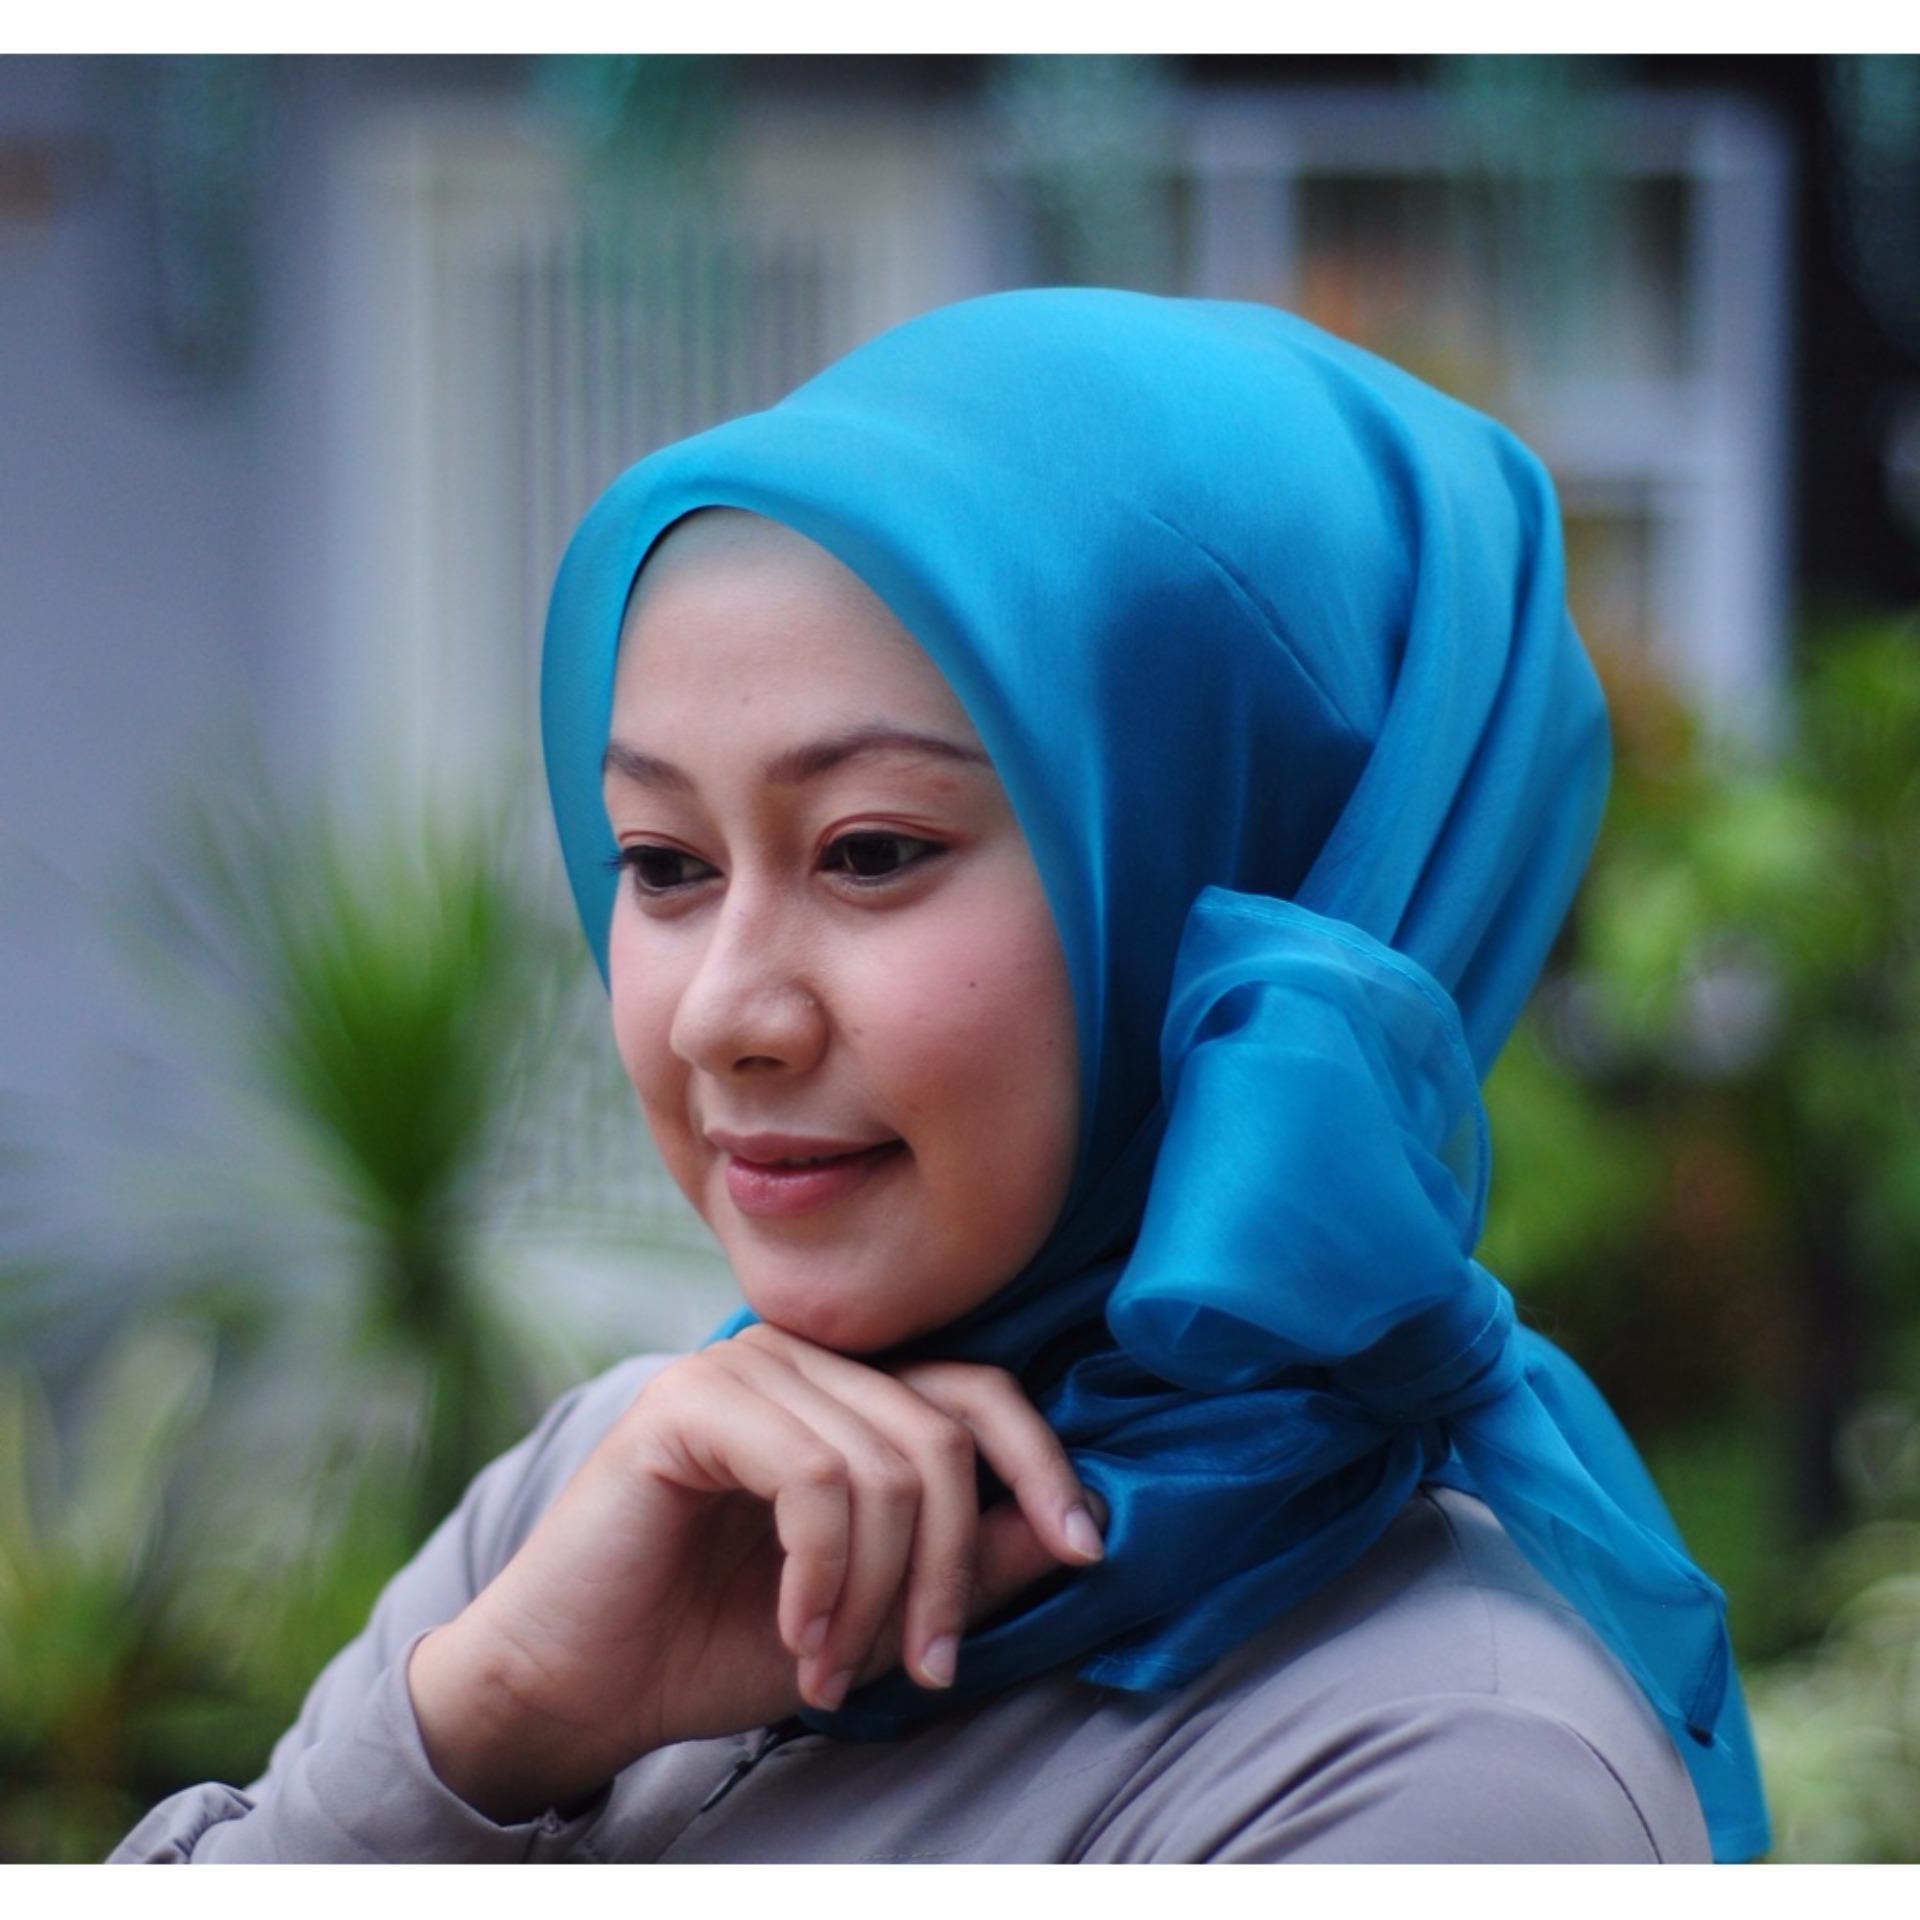 Perbandingan Harga Hijab Syari Instan Organza Biru Turkis Best Najwa Jilbab Kaos Katun Tc Premium Flash Sale Seller